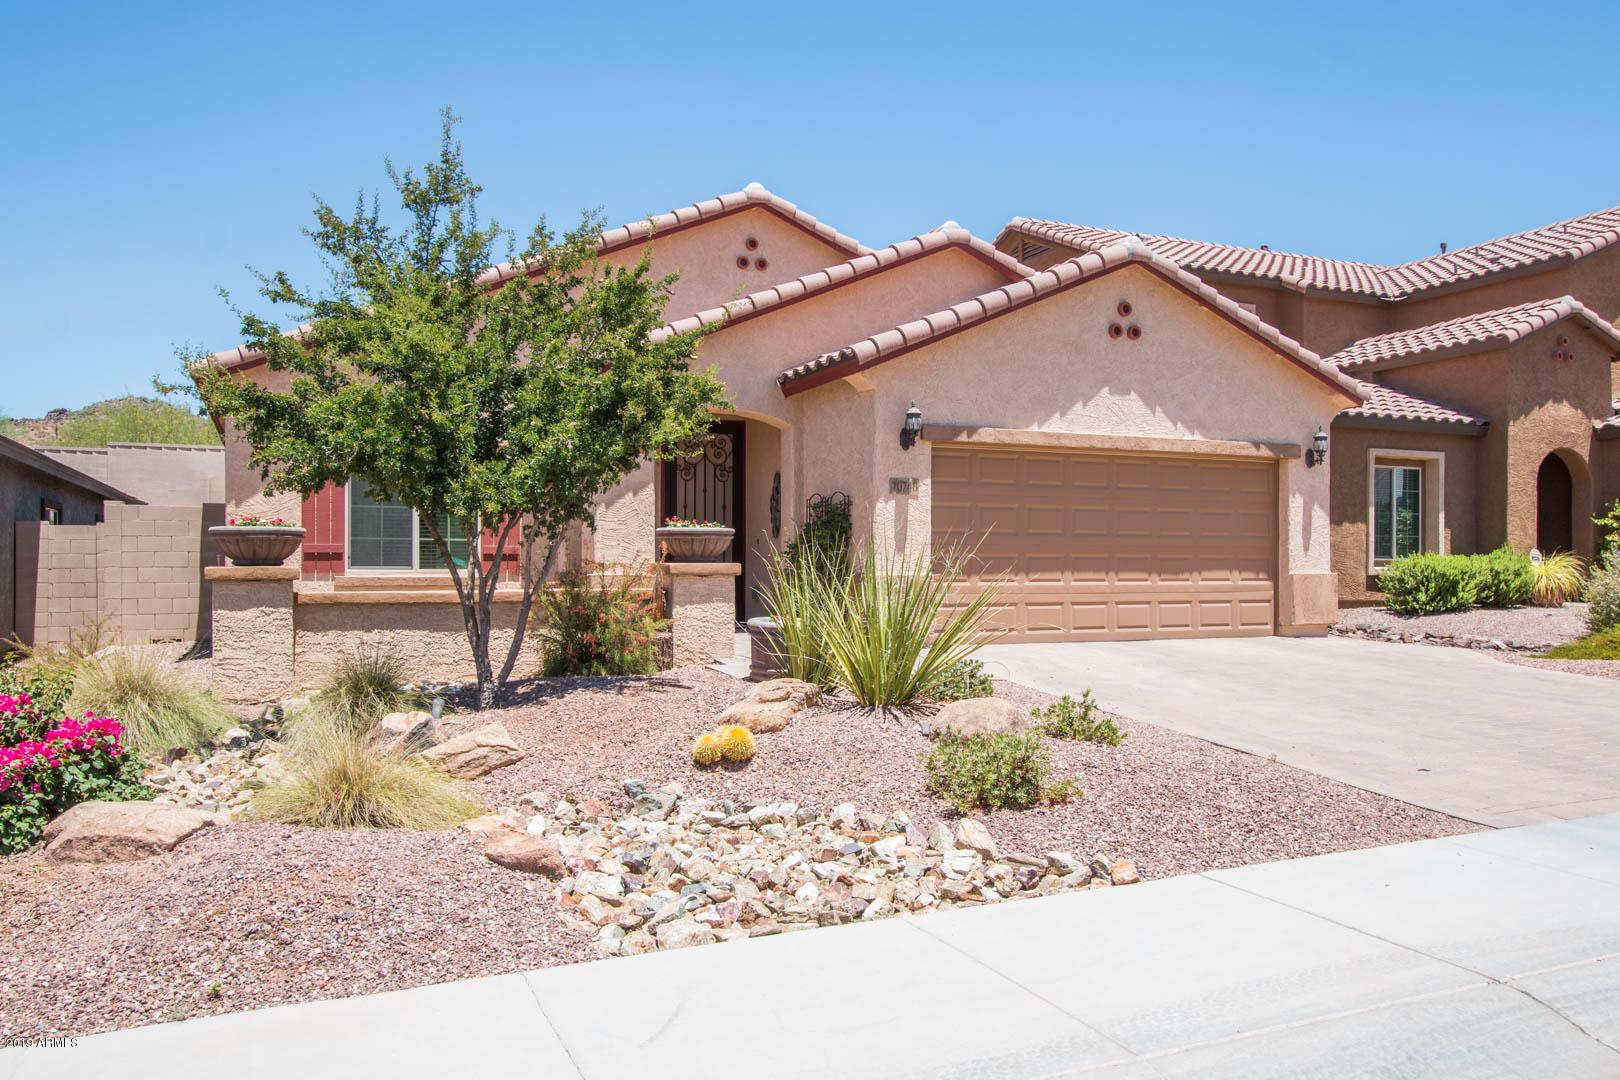 10748 W ROWEL Road, Peoria, Arizona